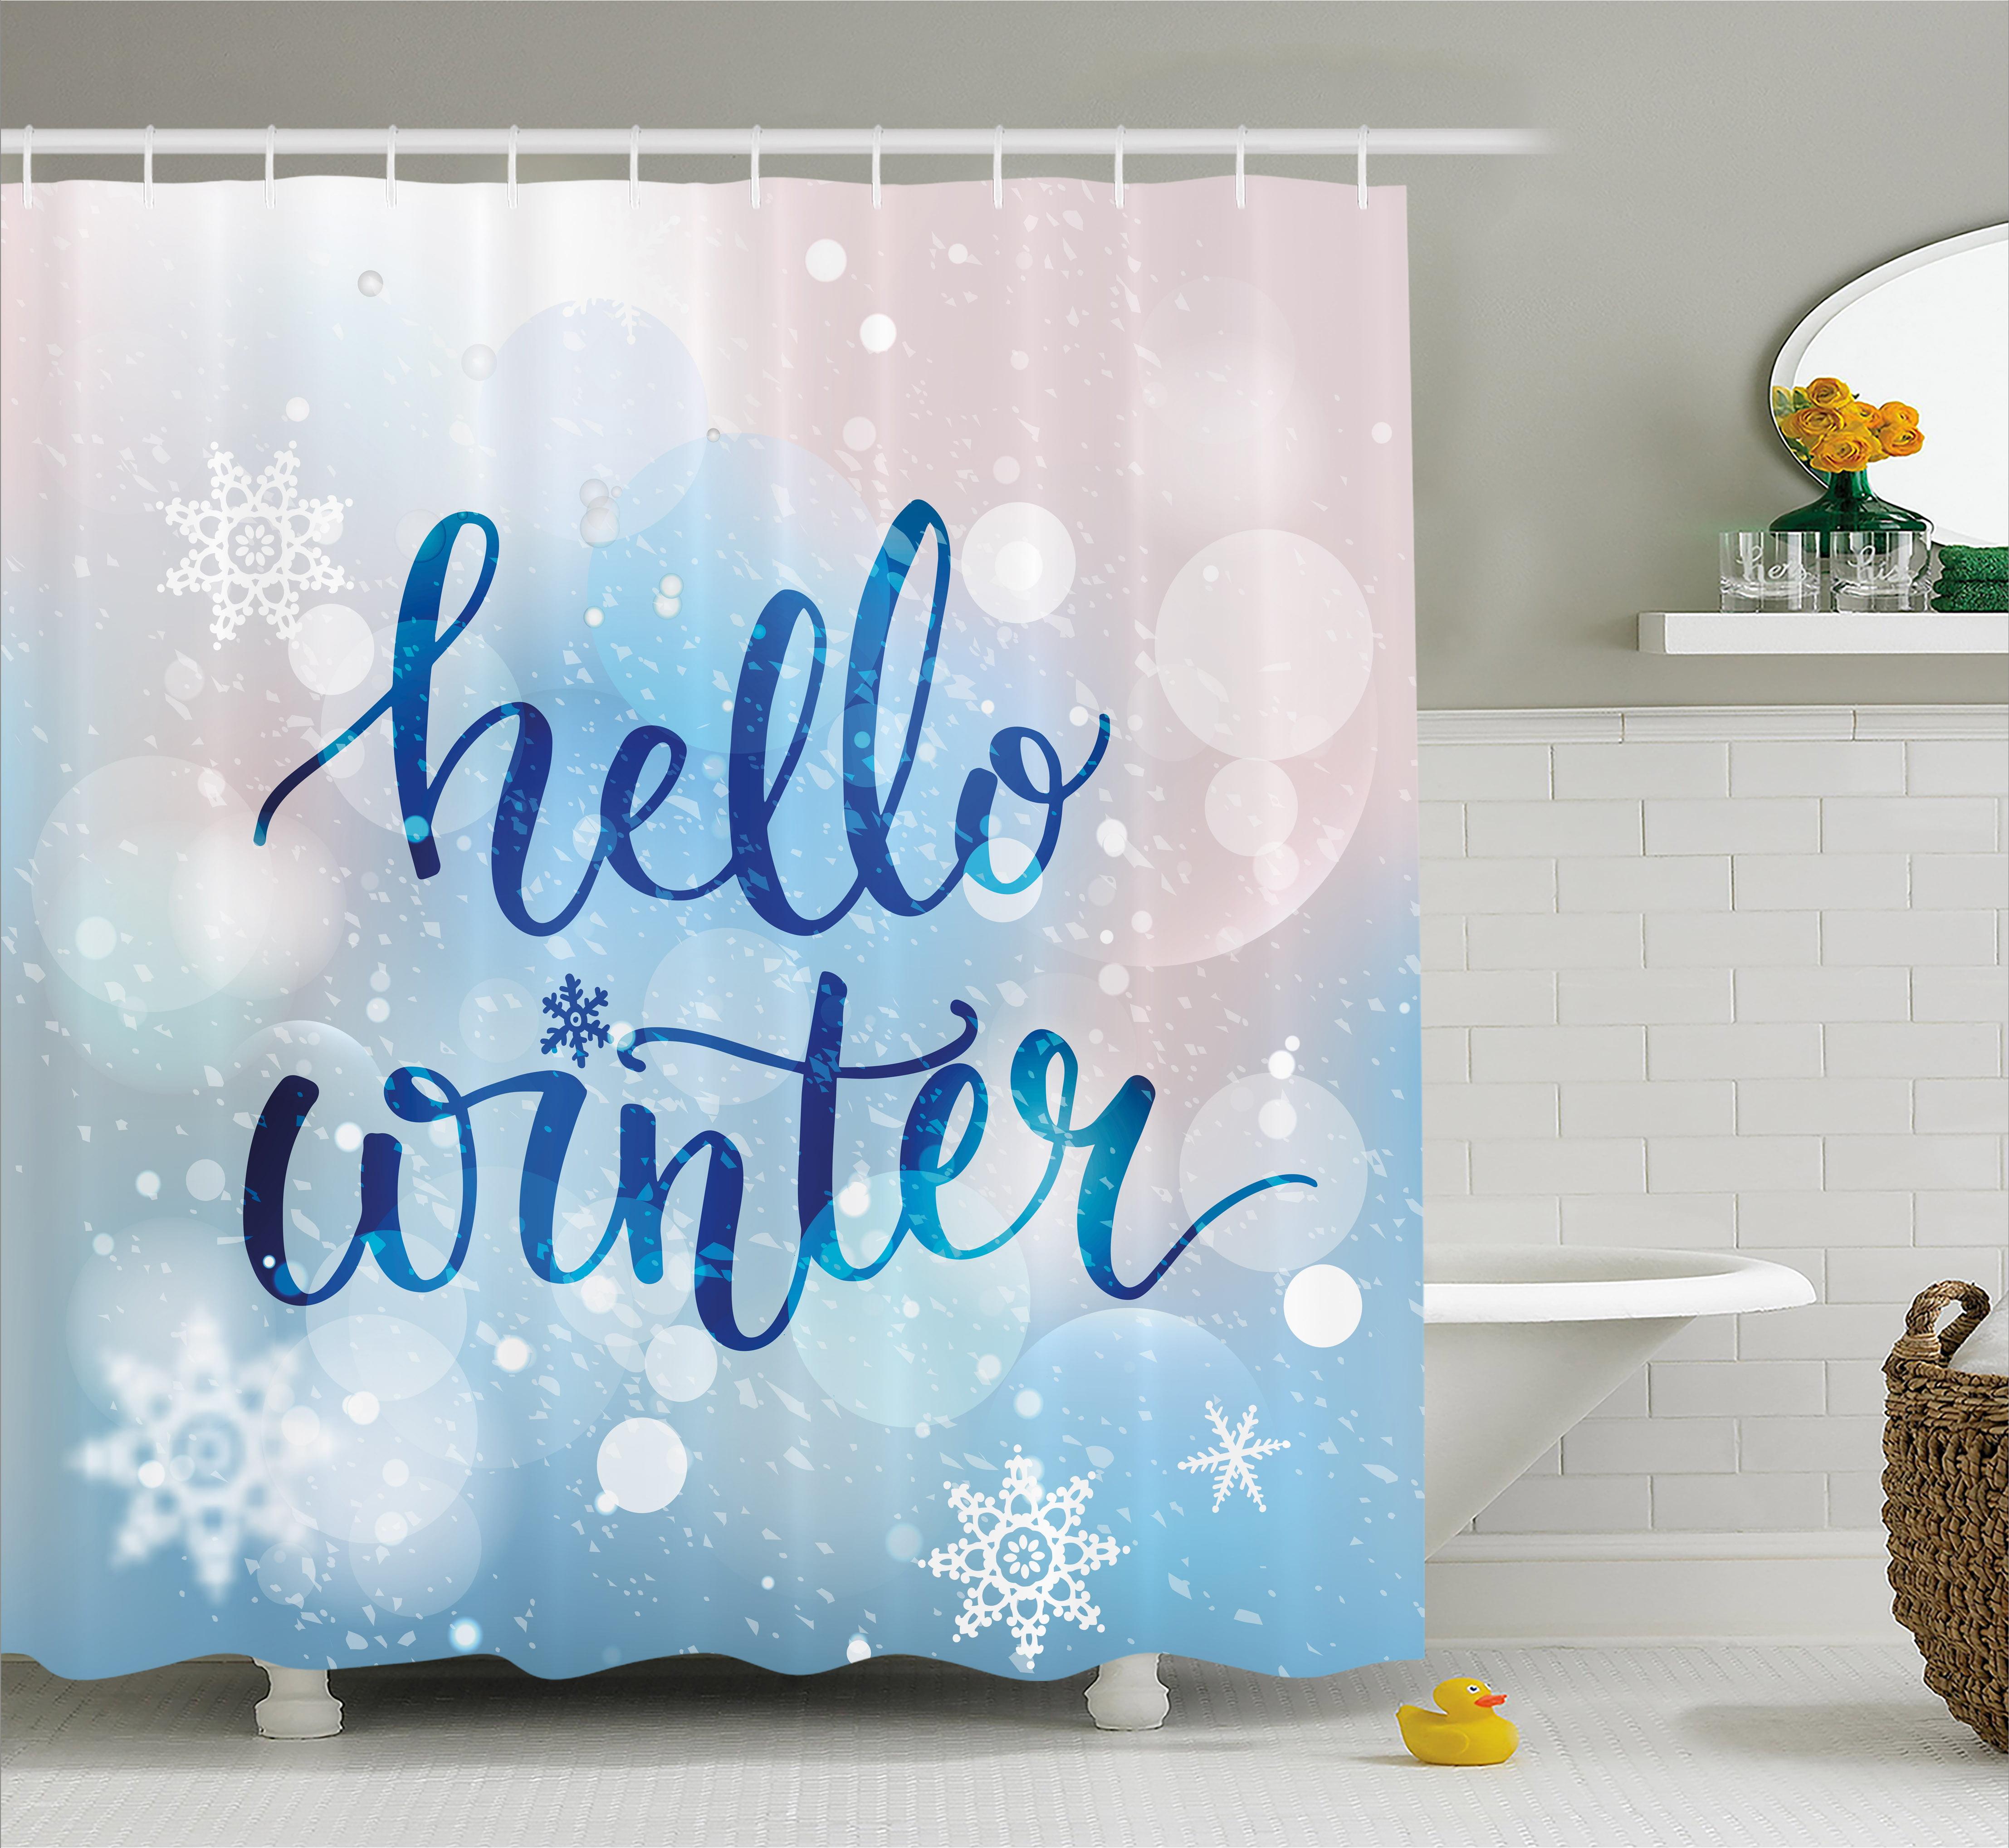 Colorful Vibrant Bokeh Fabric Shower Curtain Set Waterproof